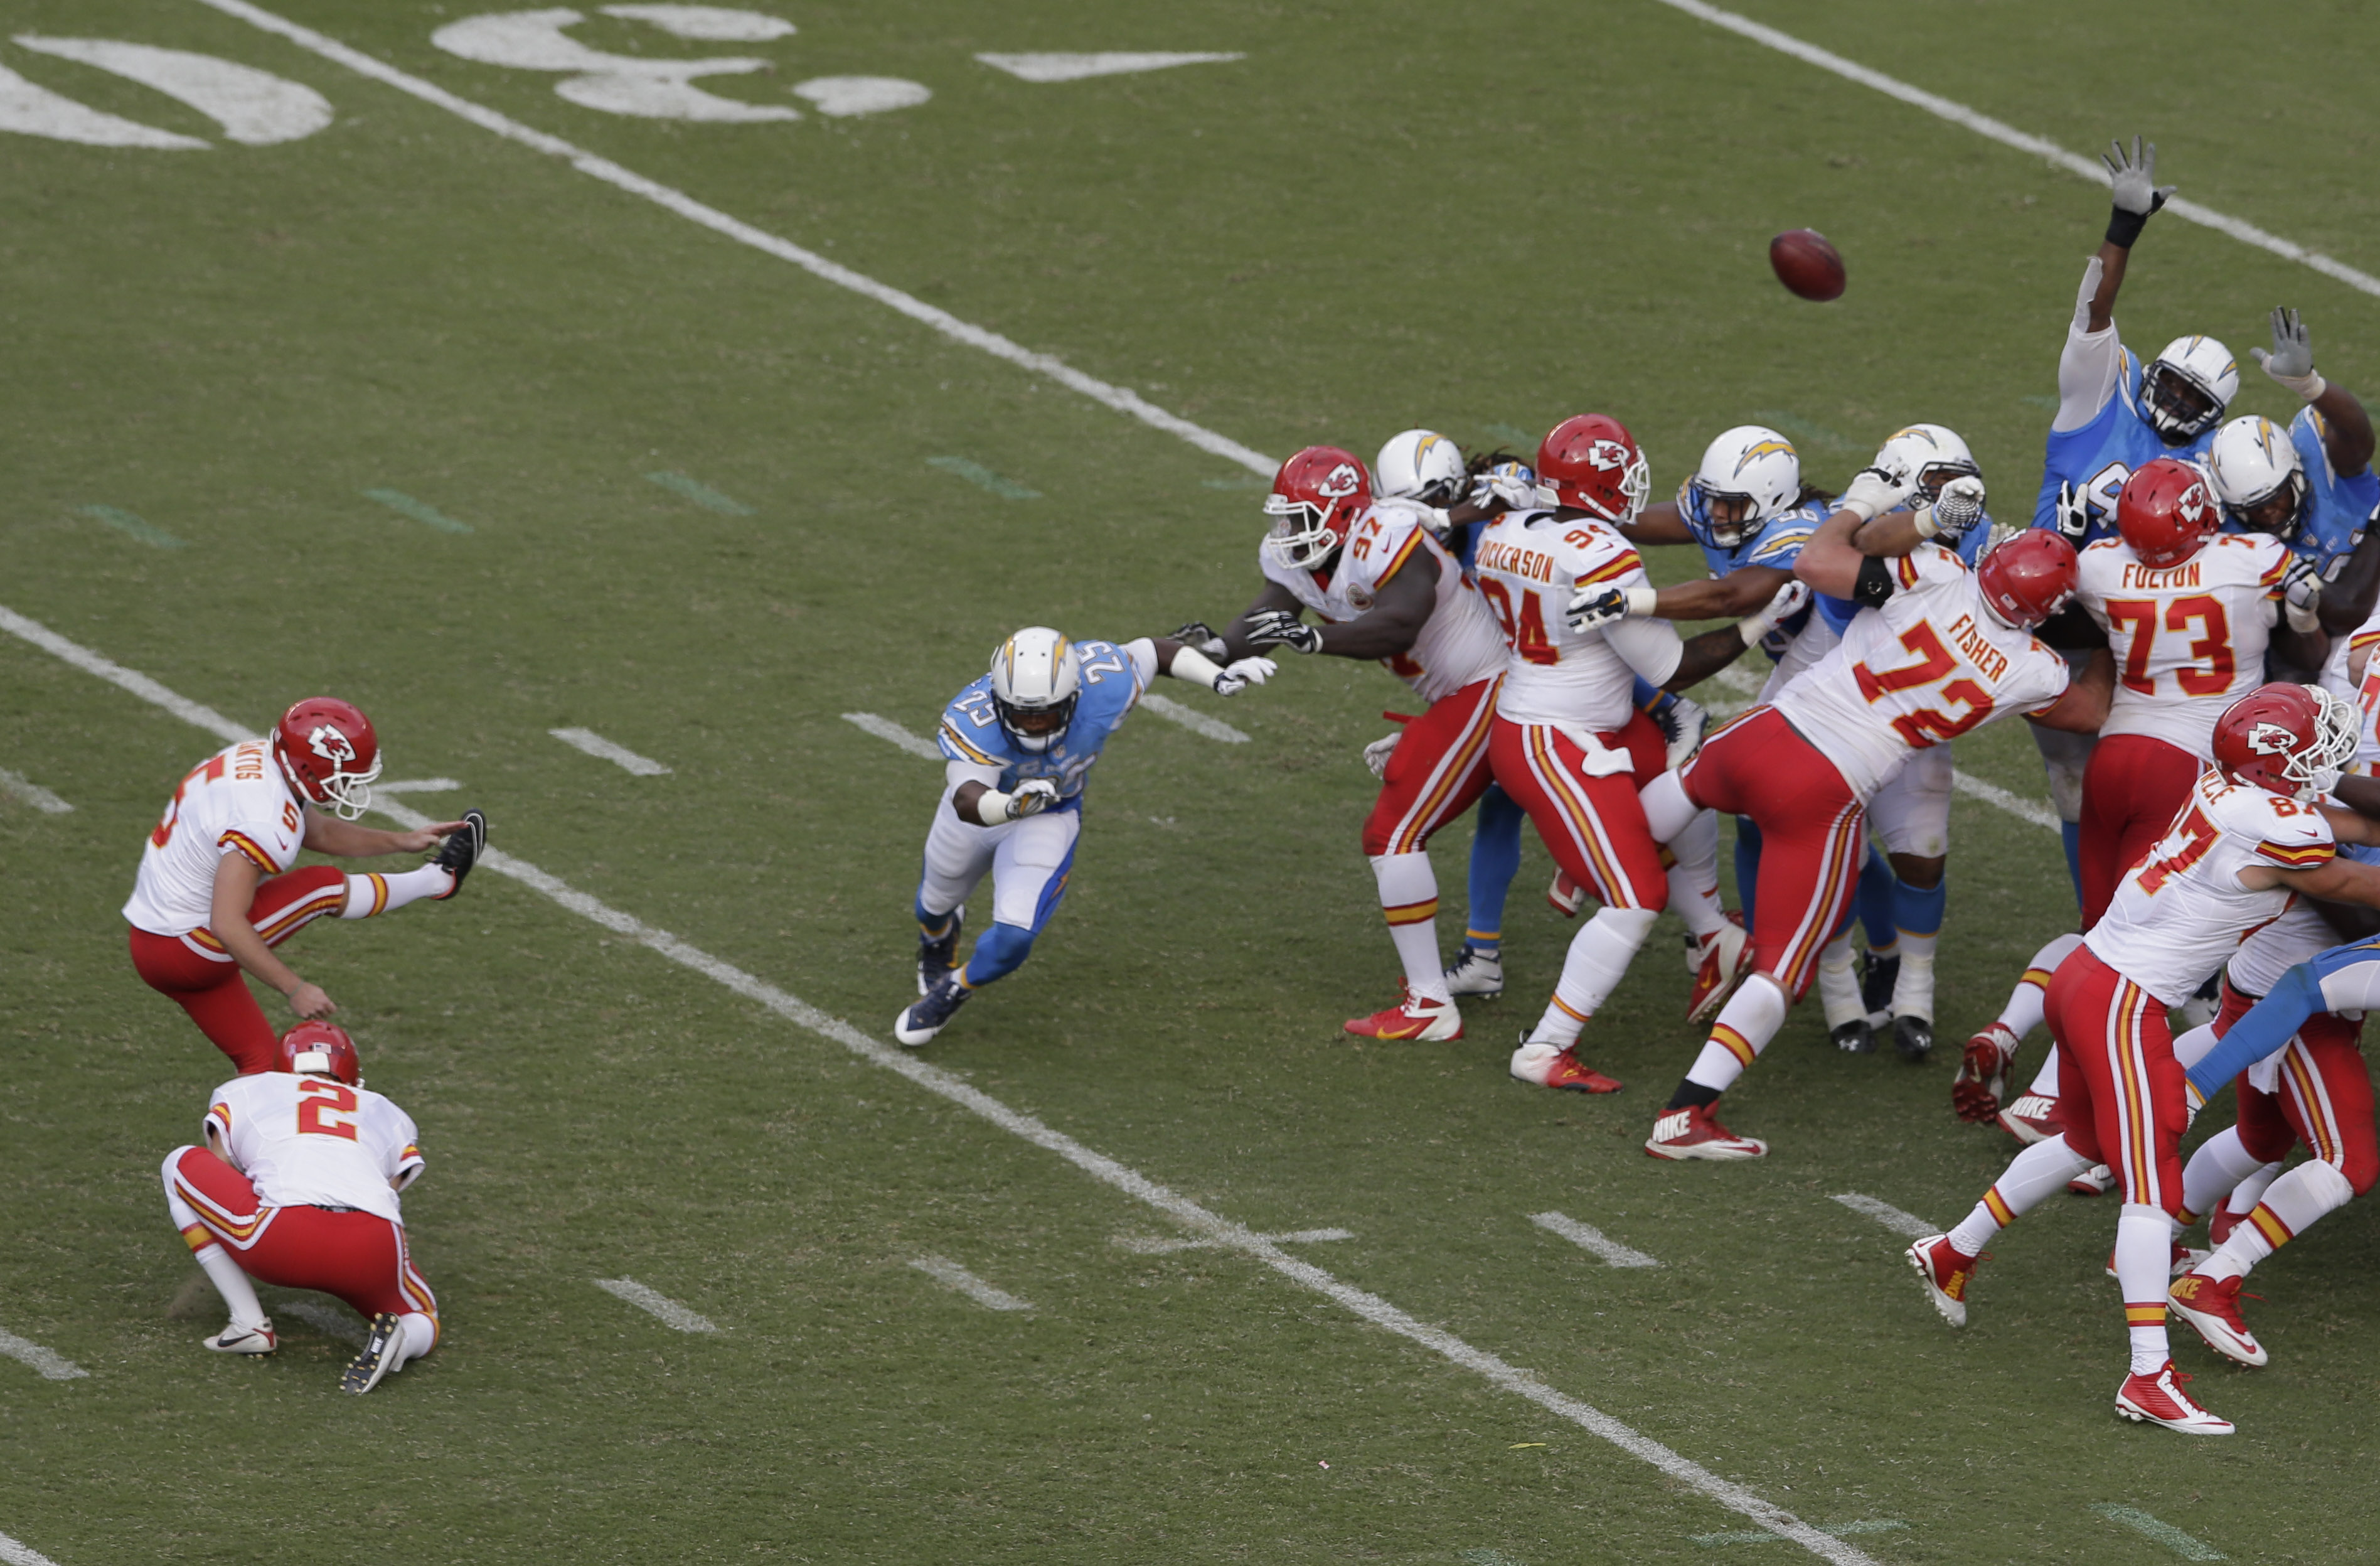 Meno touchdown, più field goal